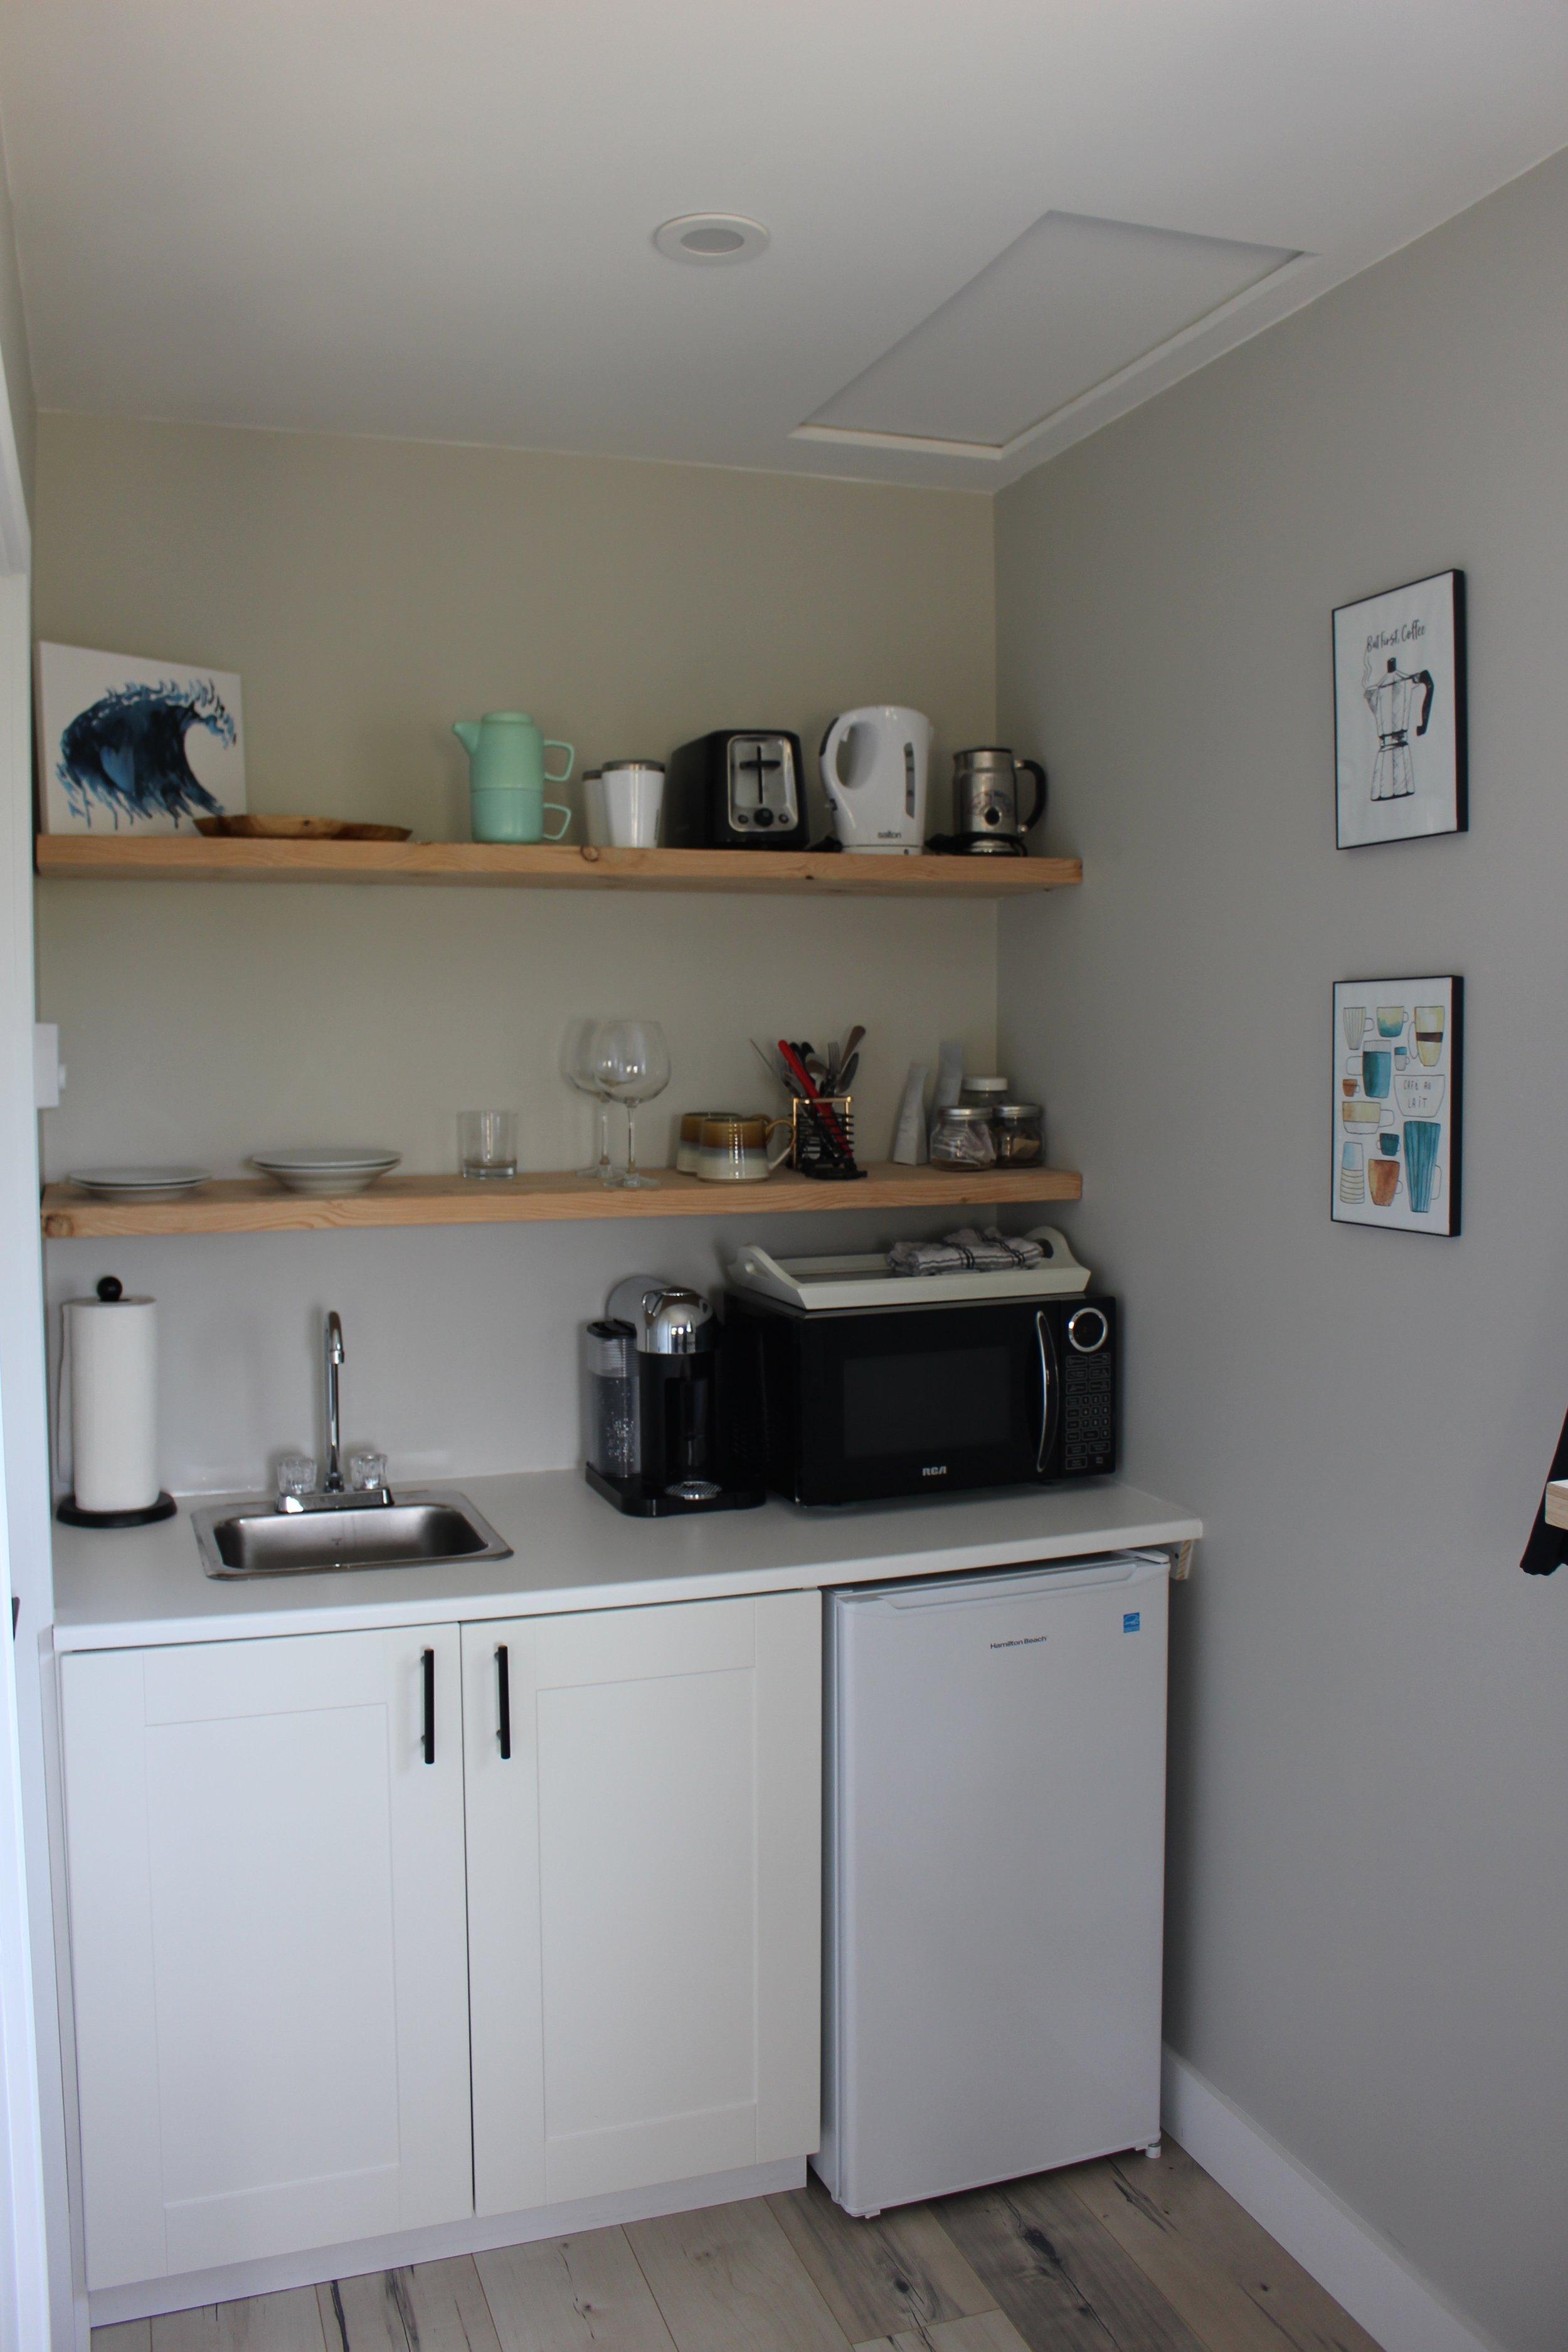 The little kitchenette